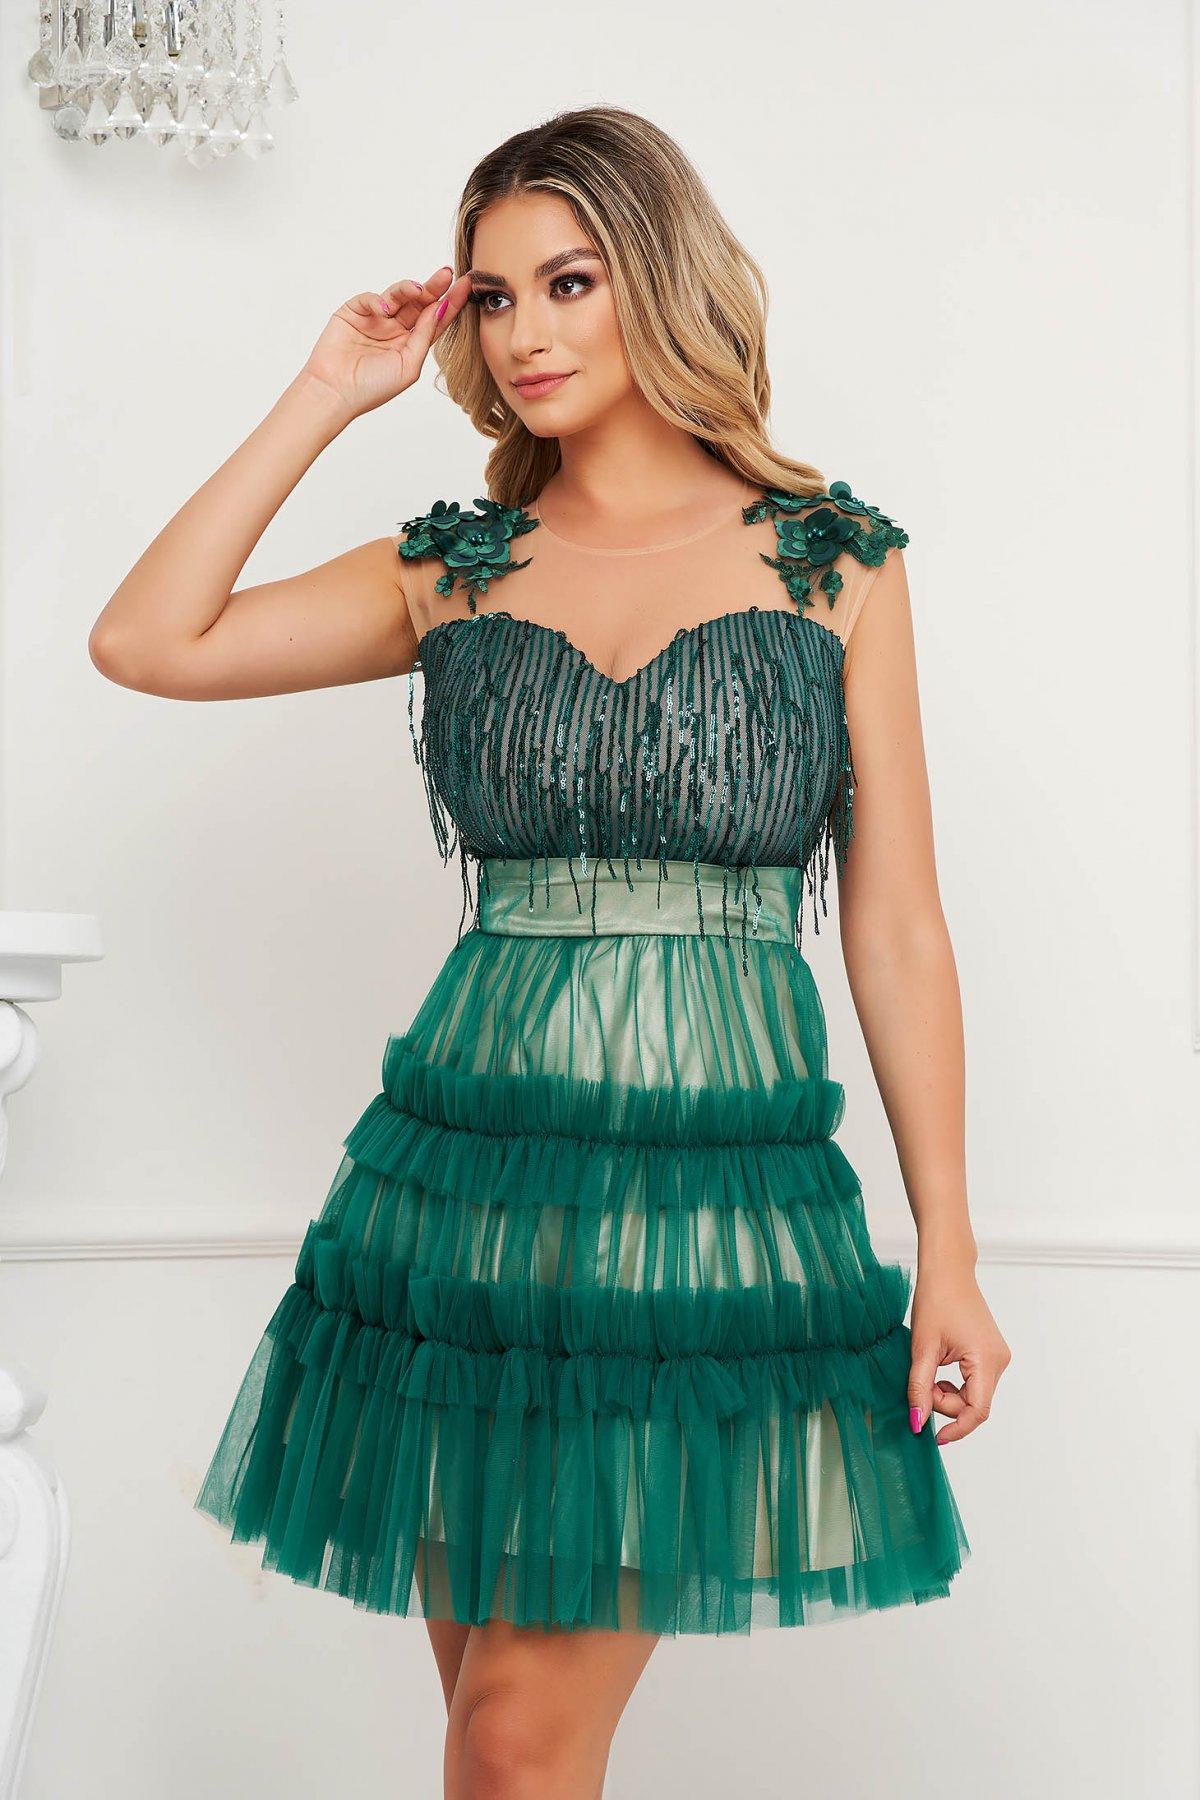 Rochie SunShine verde de ocazie cu croi in a cu aplicatii cu paiete tulle si broderie florala - medelin.ro